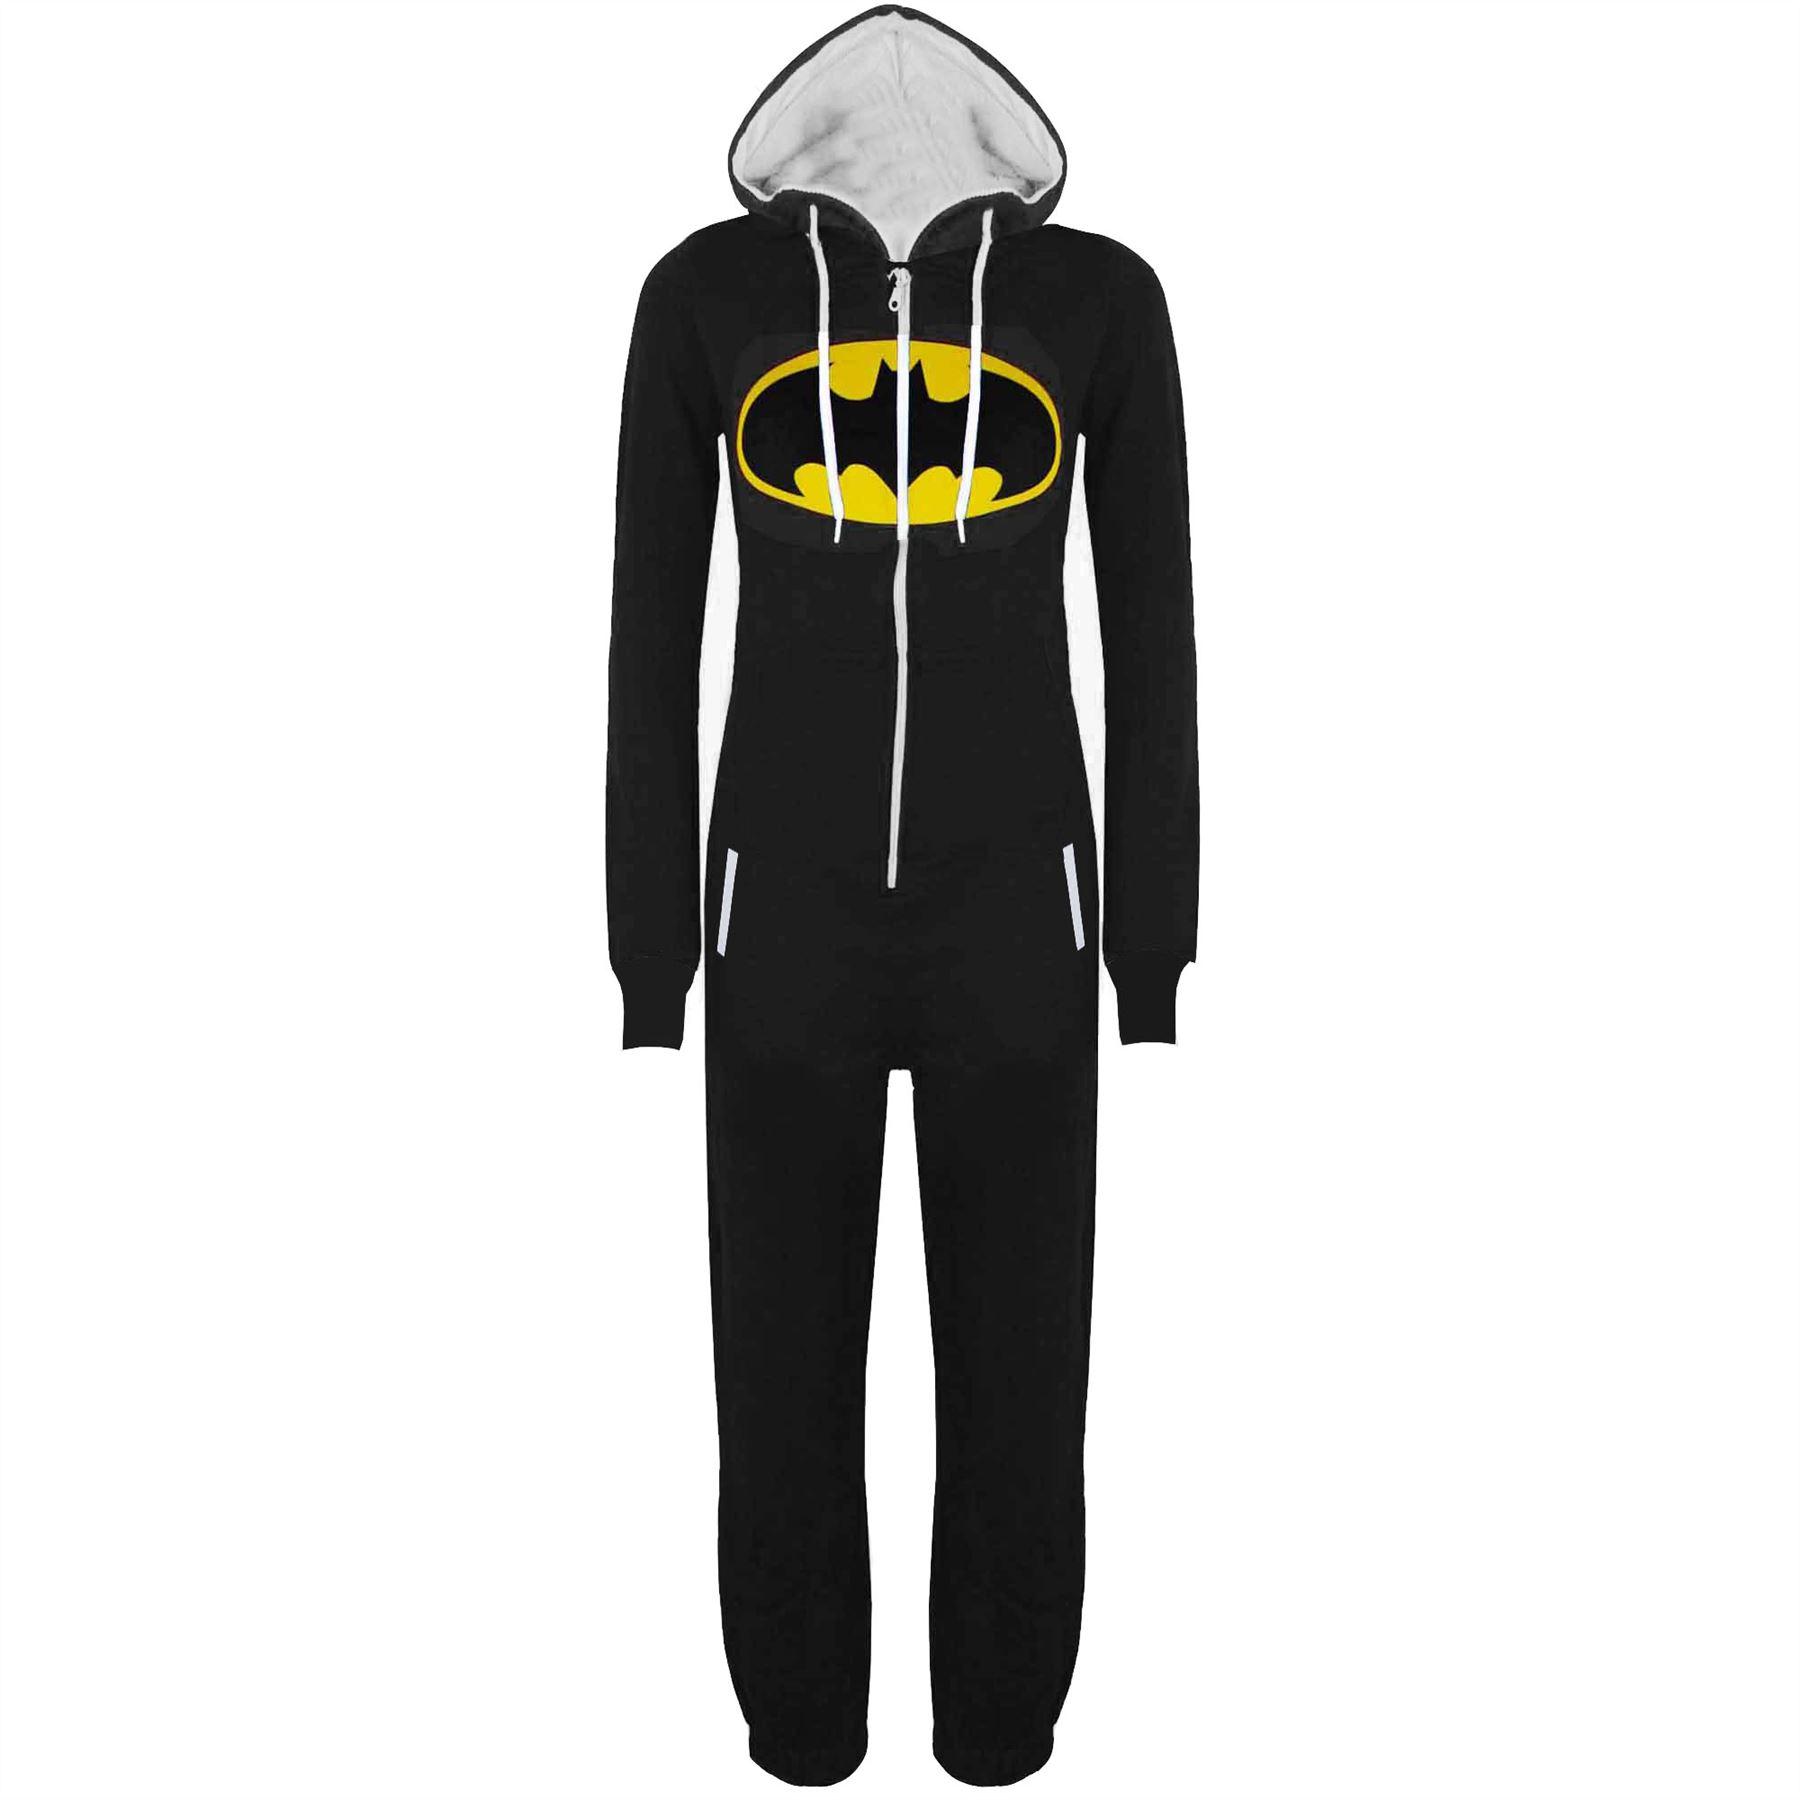 Kids-Boys-Girls-Superman-Batman-Playsuit-All-In-One-Piece-Onesie-Jumpsuit-Size